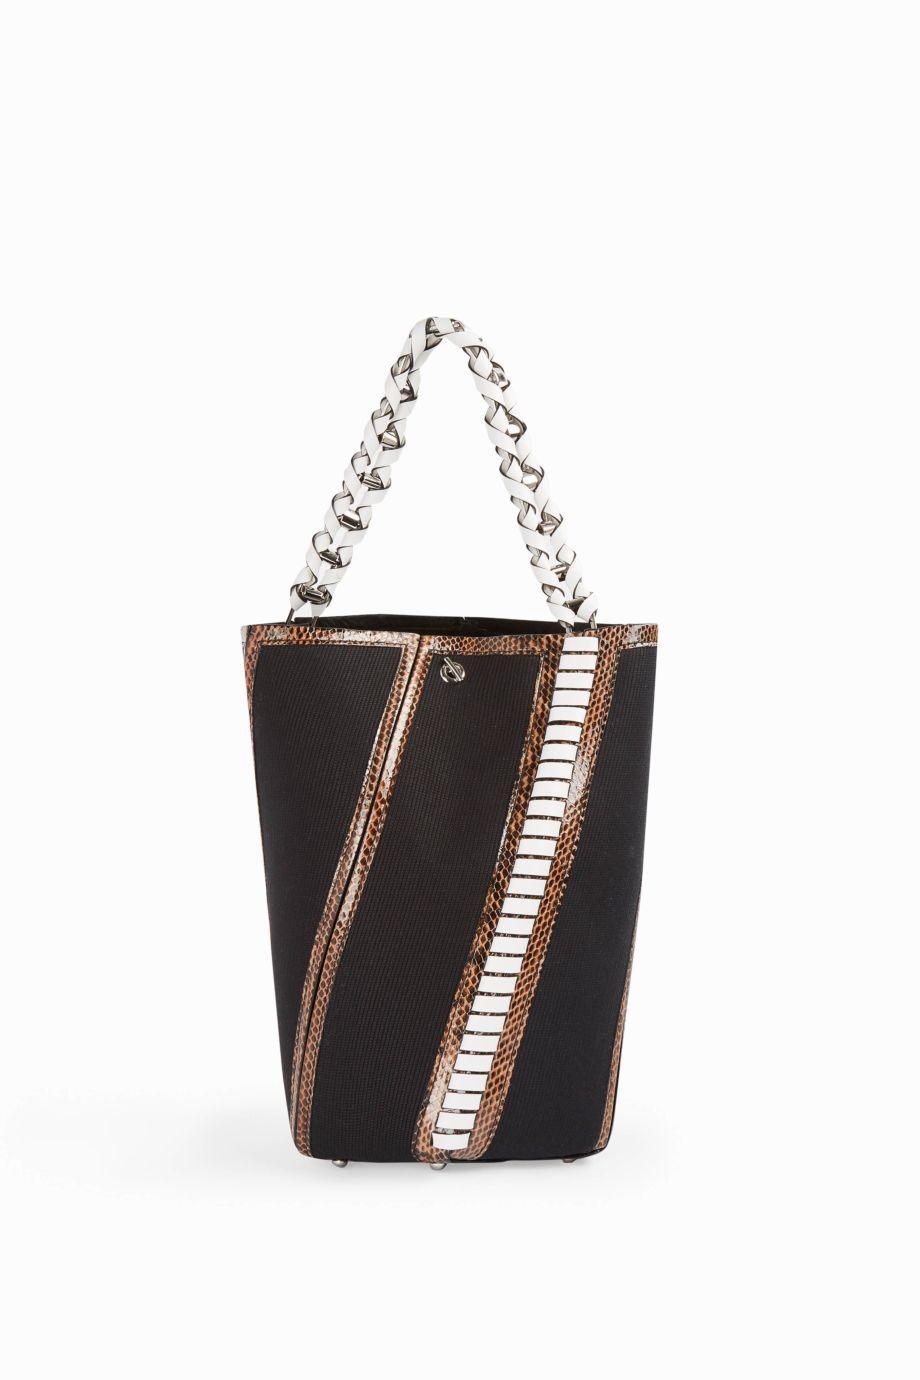 Proenza Schouler  HEX WHIP-STITCH DETAIL BAG